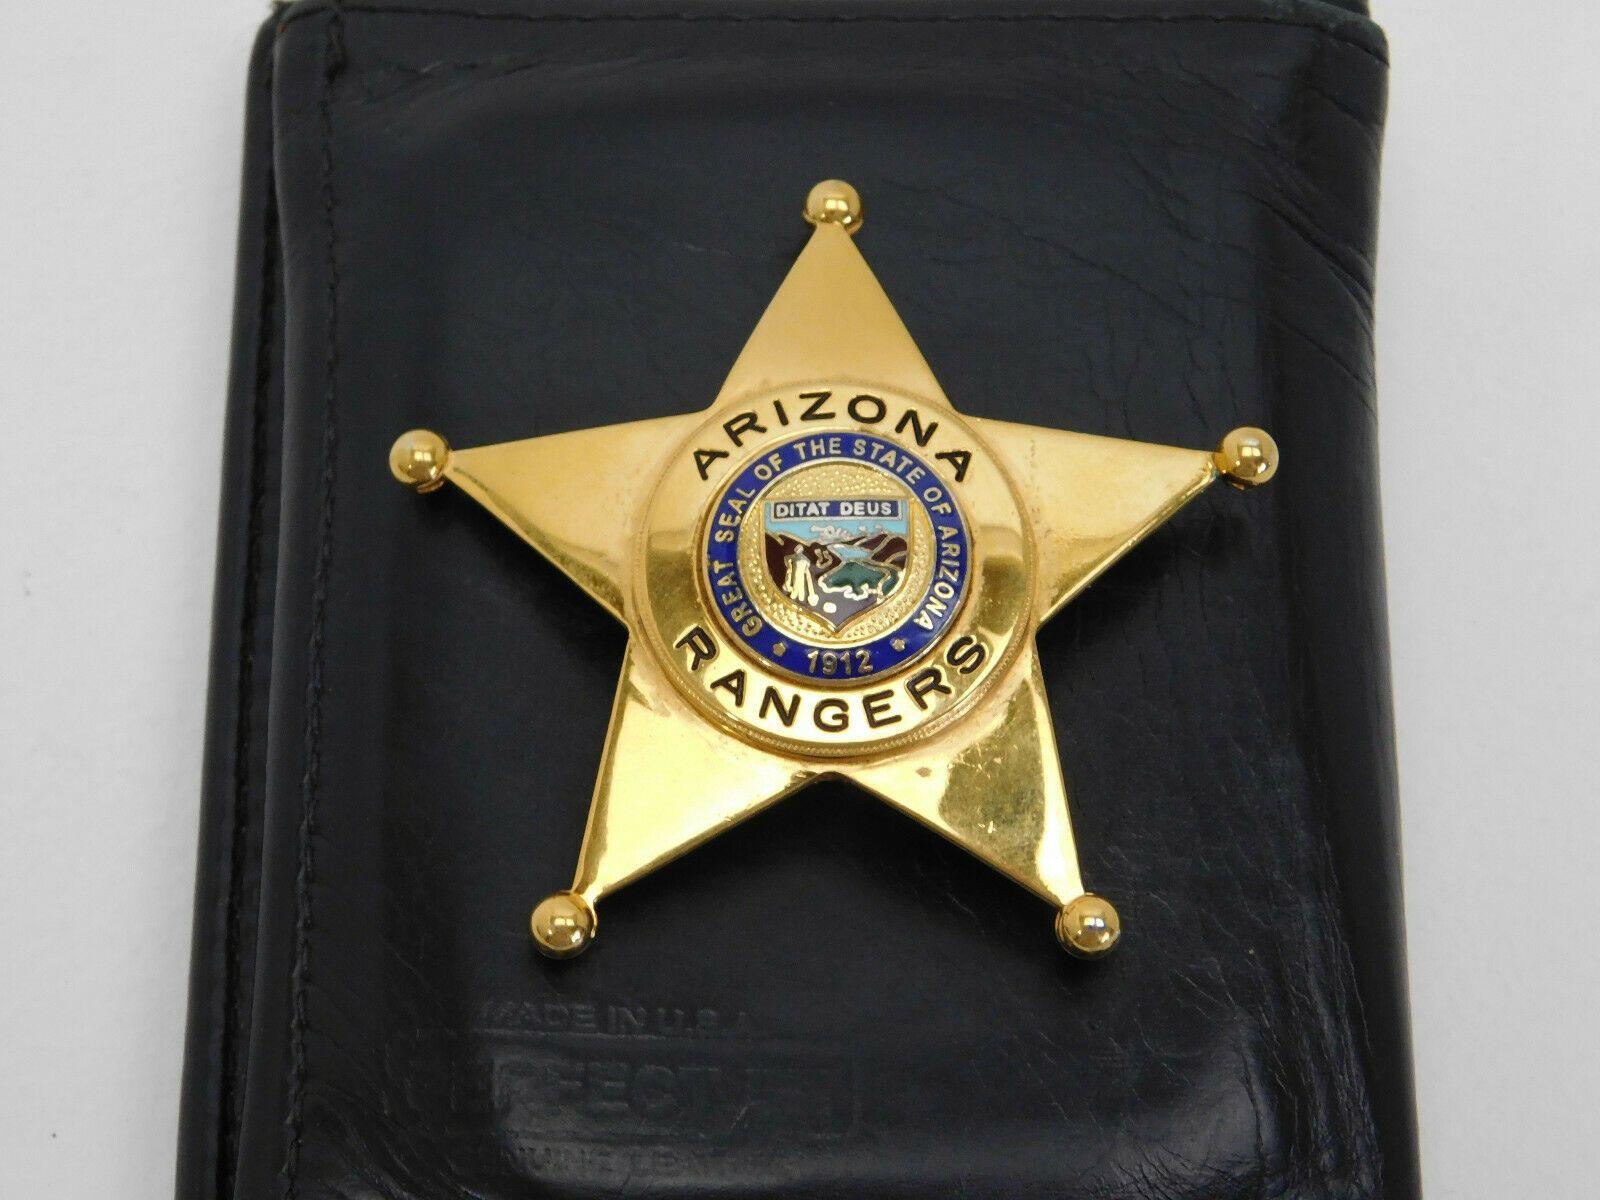 Arizona rangers smith and warren police badge badge